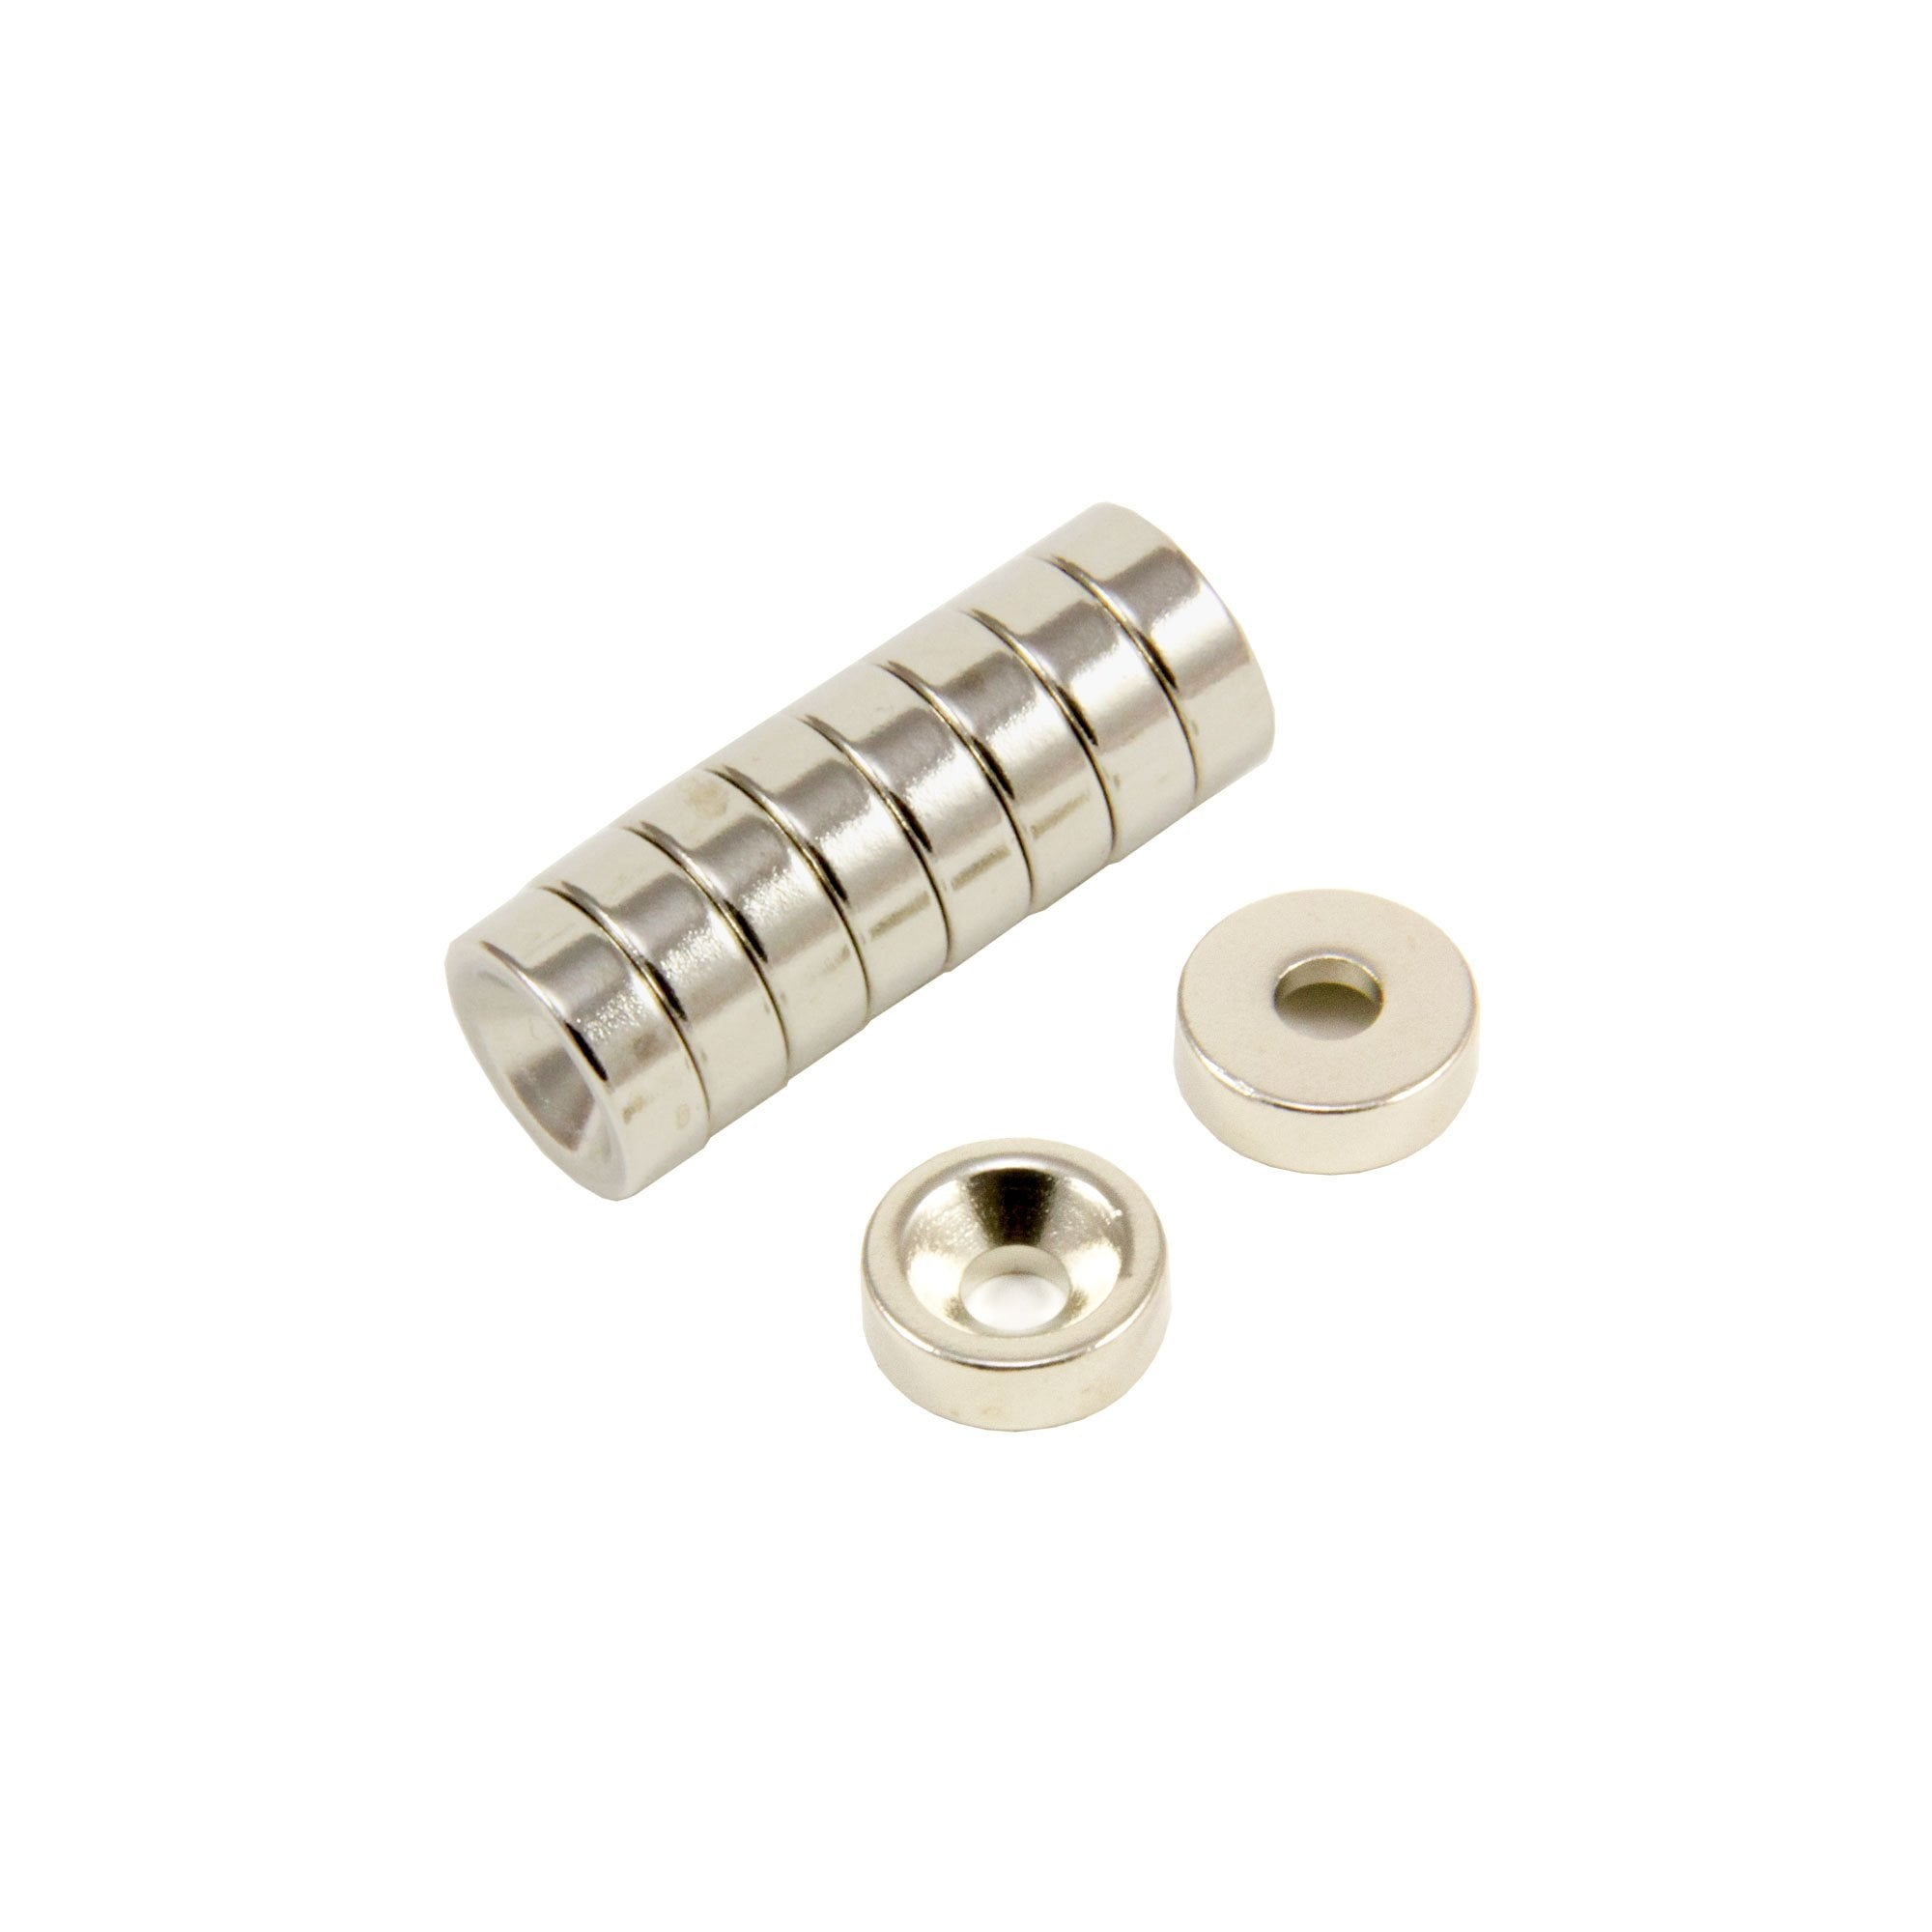 0.5kg Pull 5mm dia x 10mm thick Samarium Cobalt Magnet High Temp x4